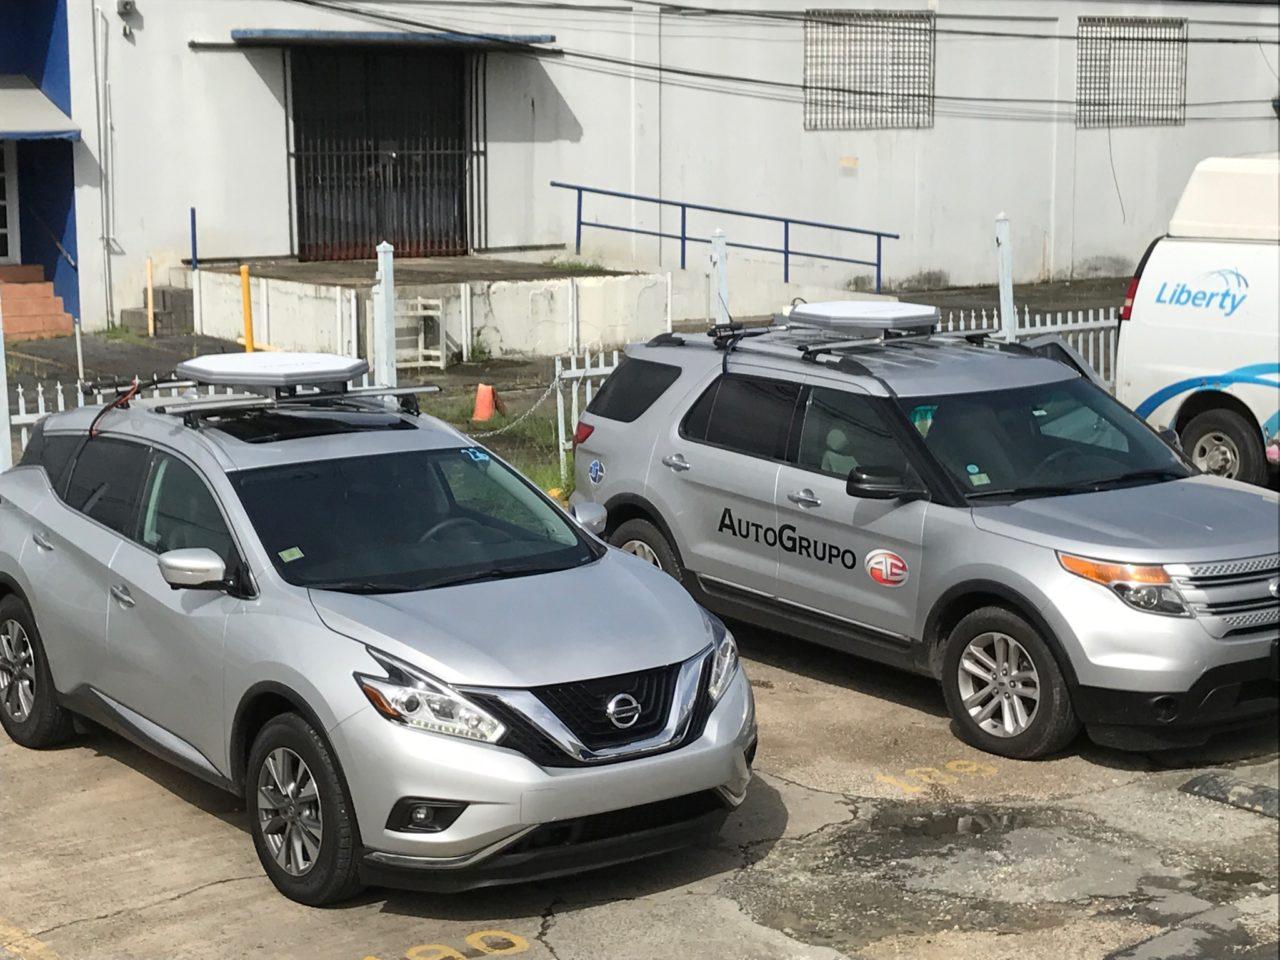 Liberty Global vehicles equipped with Kymeta antennas. Photo: Kymeta.